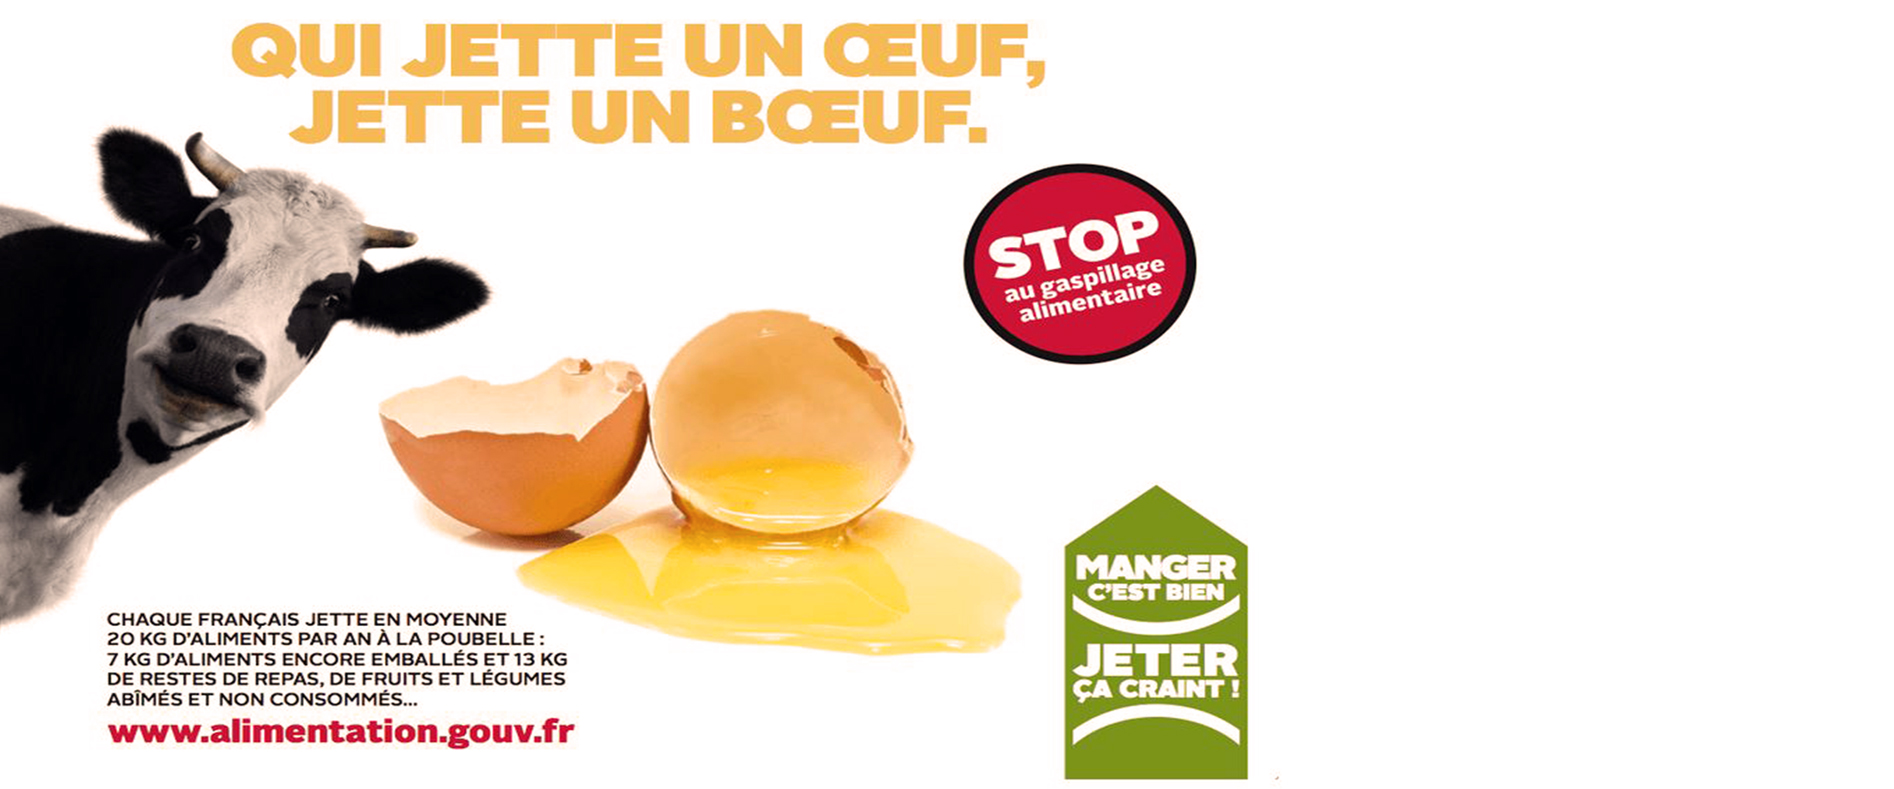 Luttons contre le gaspillage alimentaire !